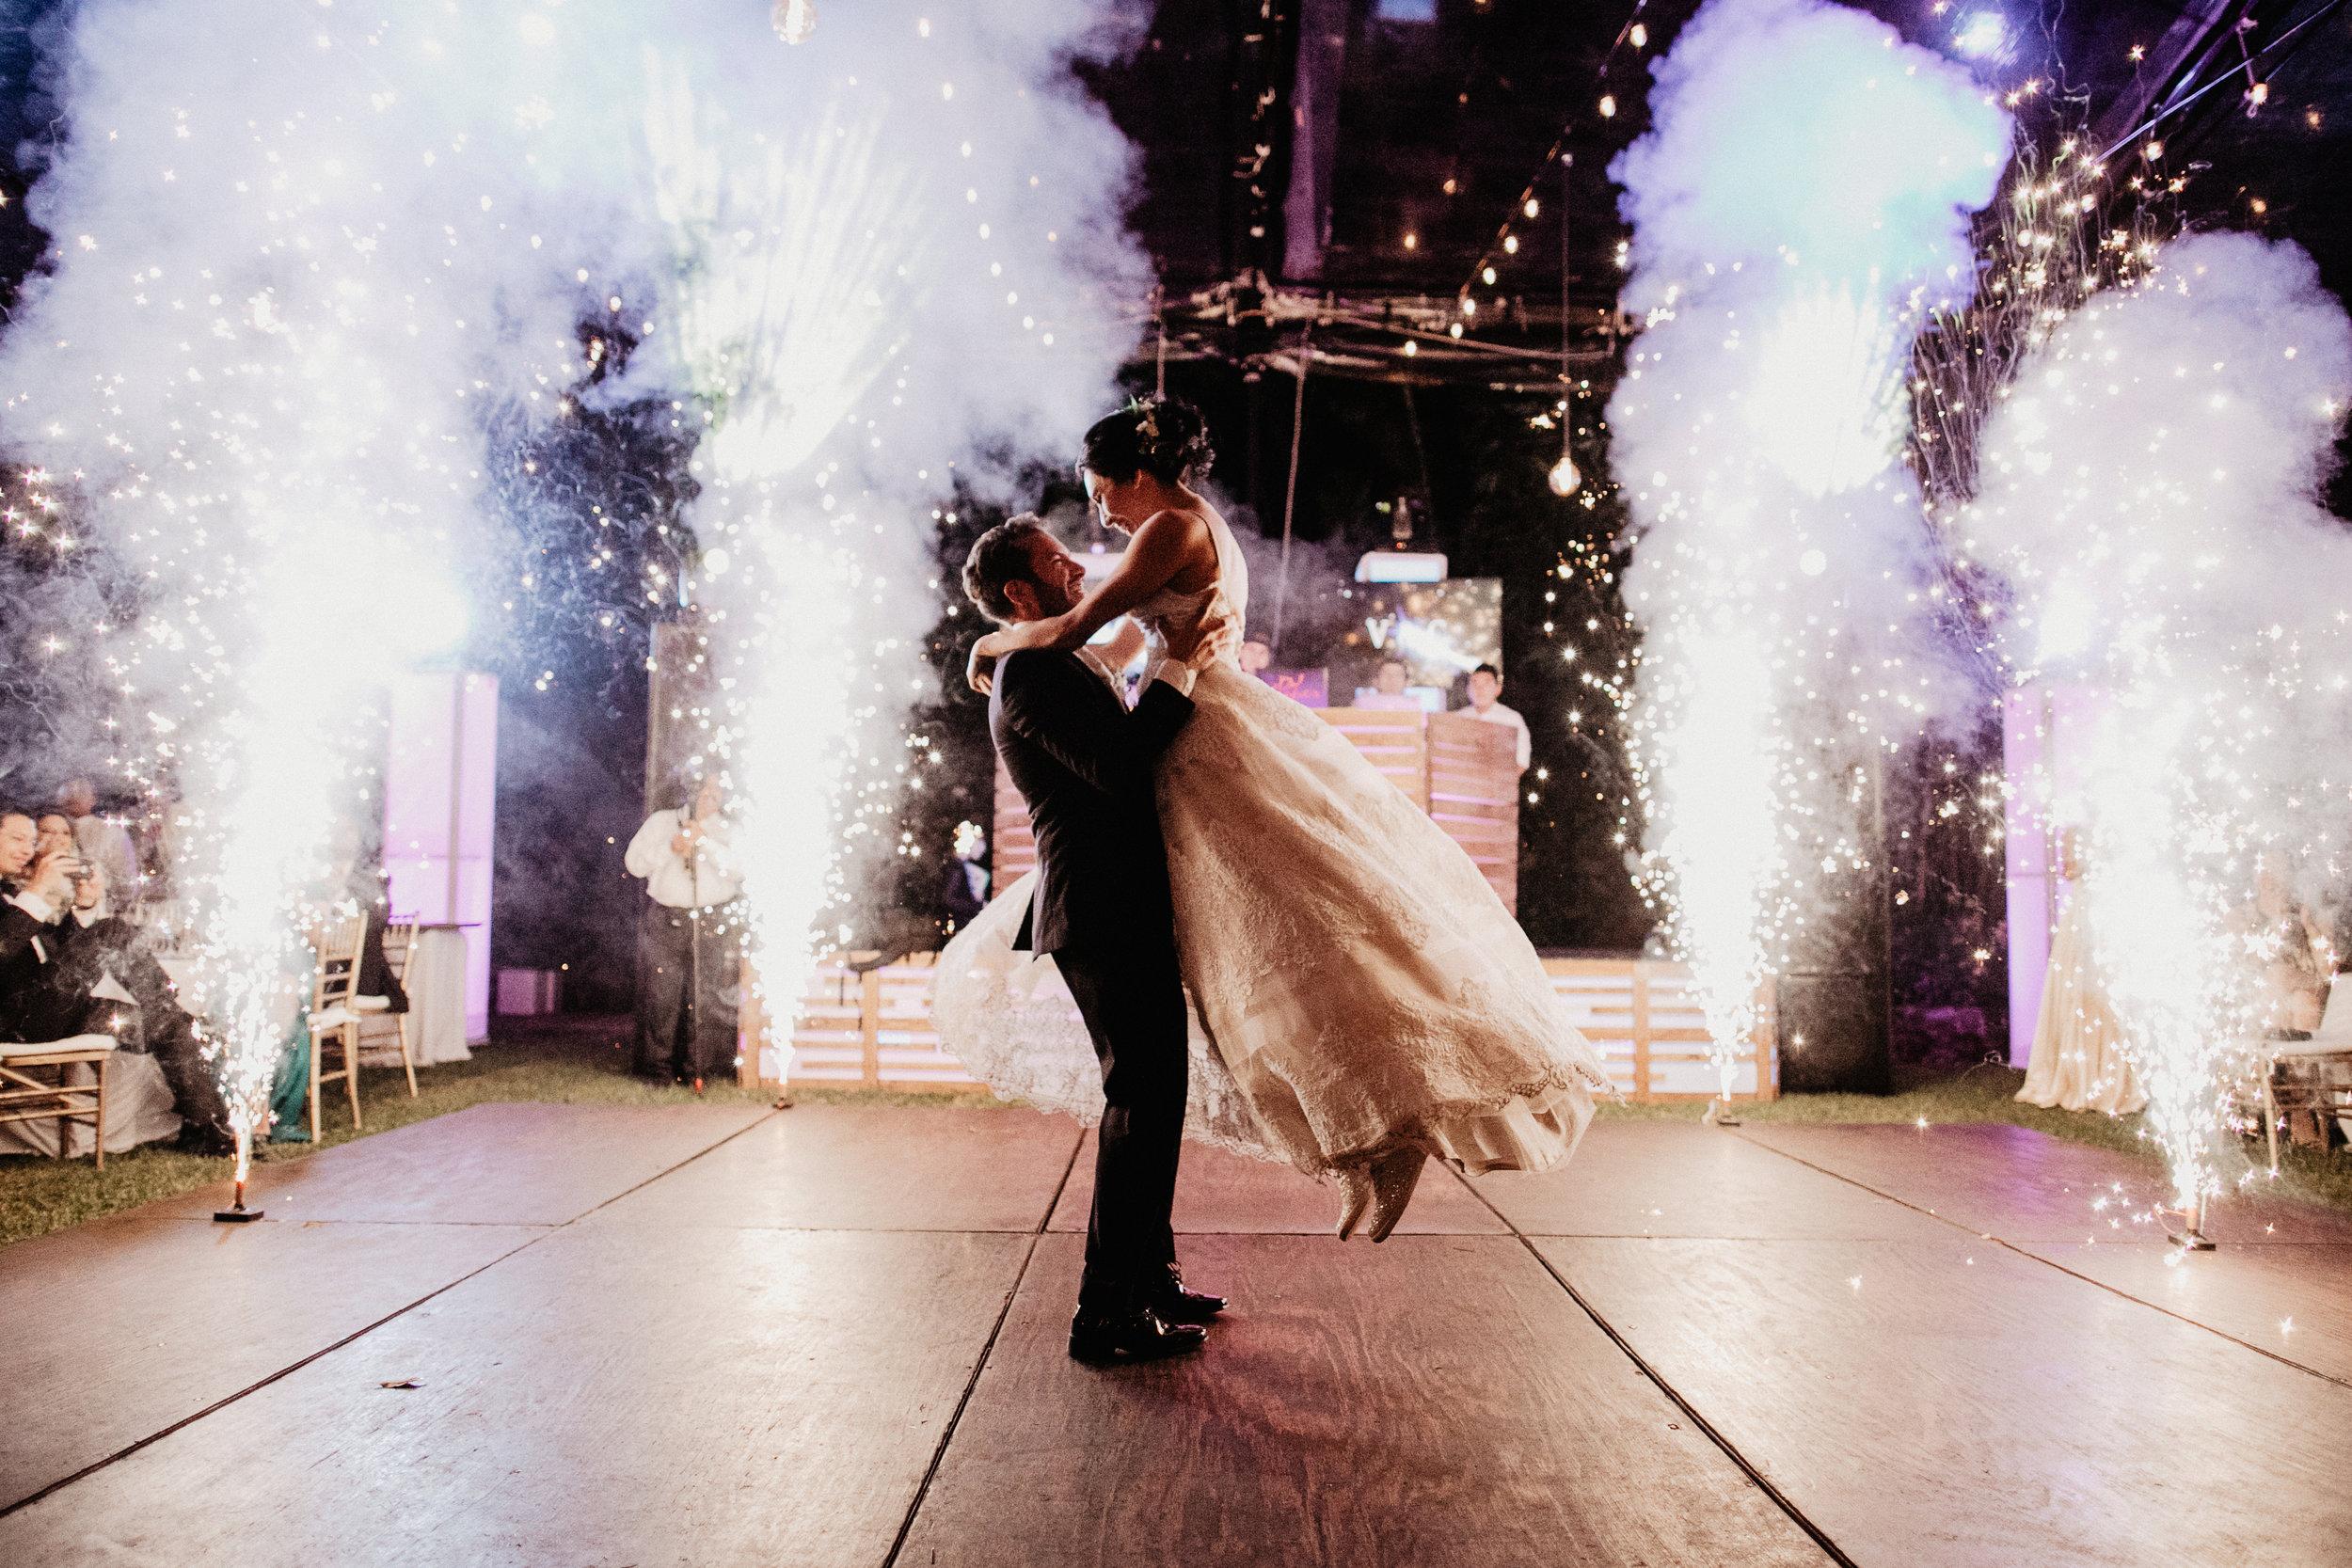 Alfonso_flores_destination_wedding_photography_vanesa_carlos-1028.JPG